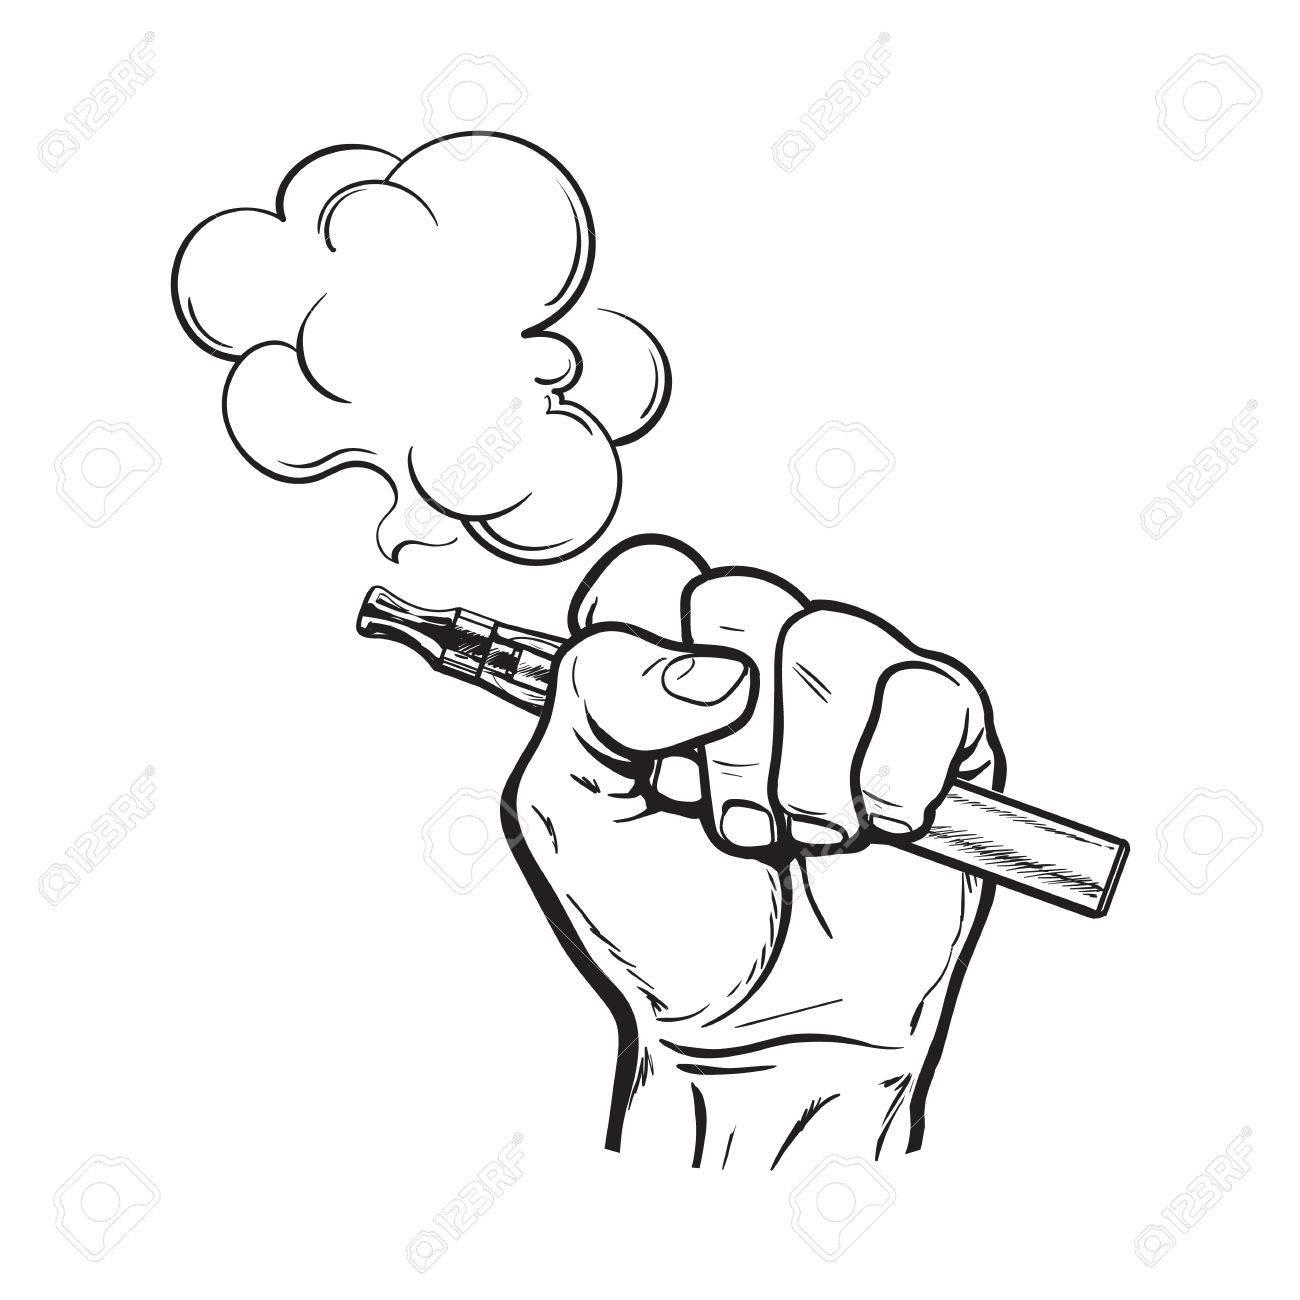 1300x1300 Male Hand Holding E Cigarette, Electronic Cigarette, Vapor